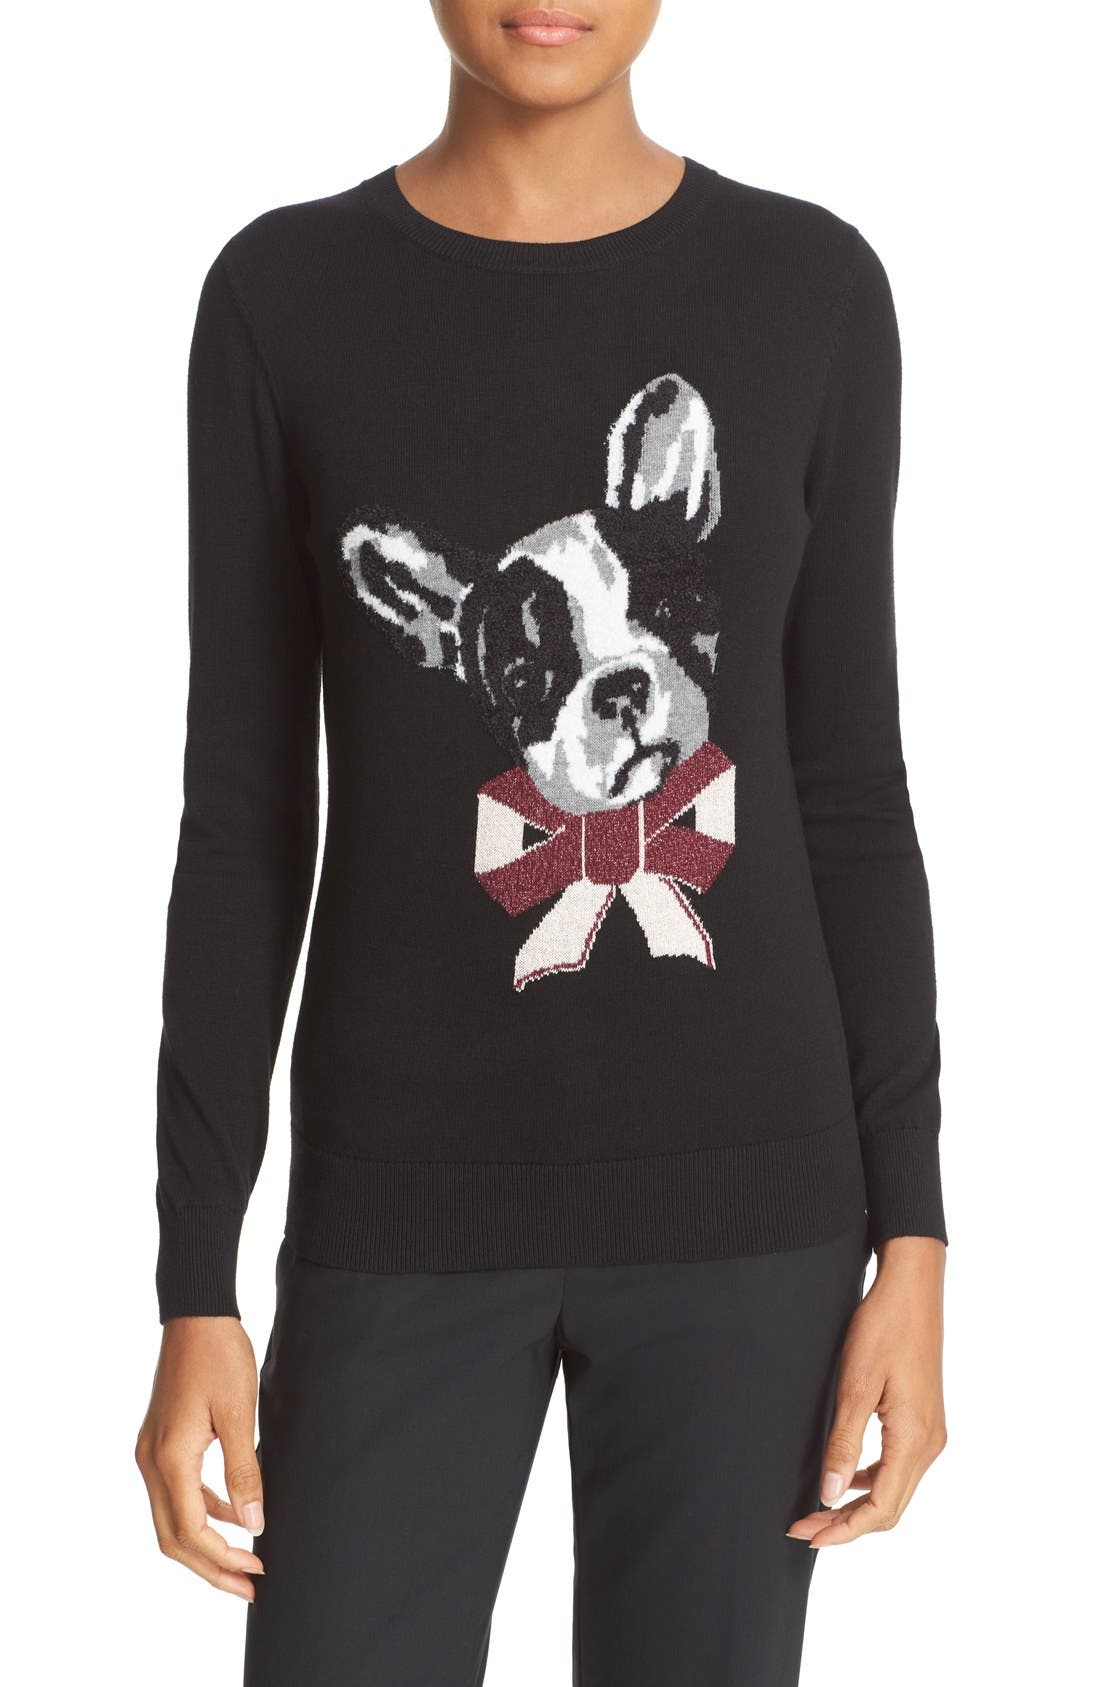 Alternate Image 1 Selected - Ted Baker London Henie Merry Woofmas Sweater